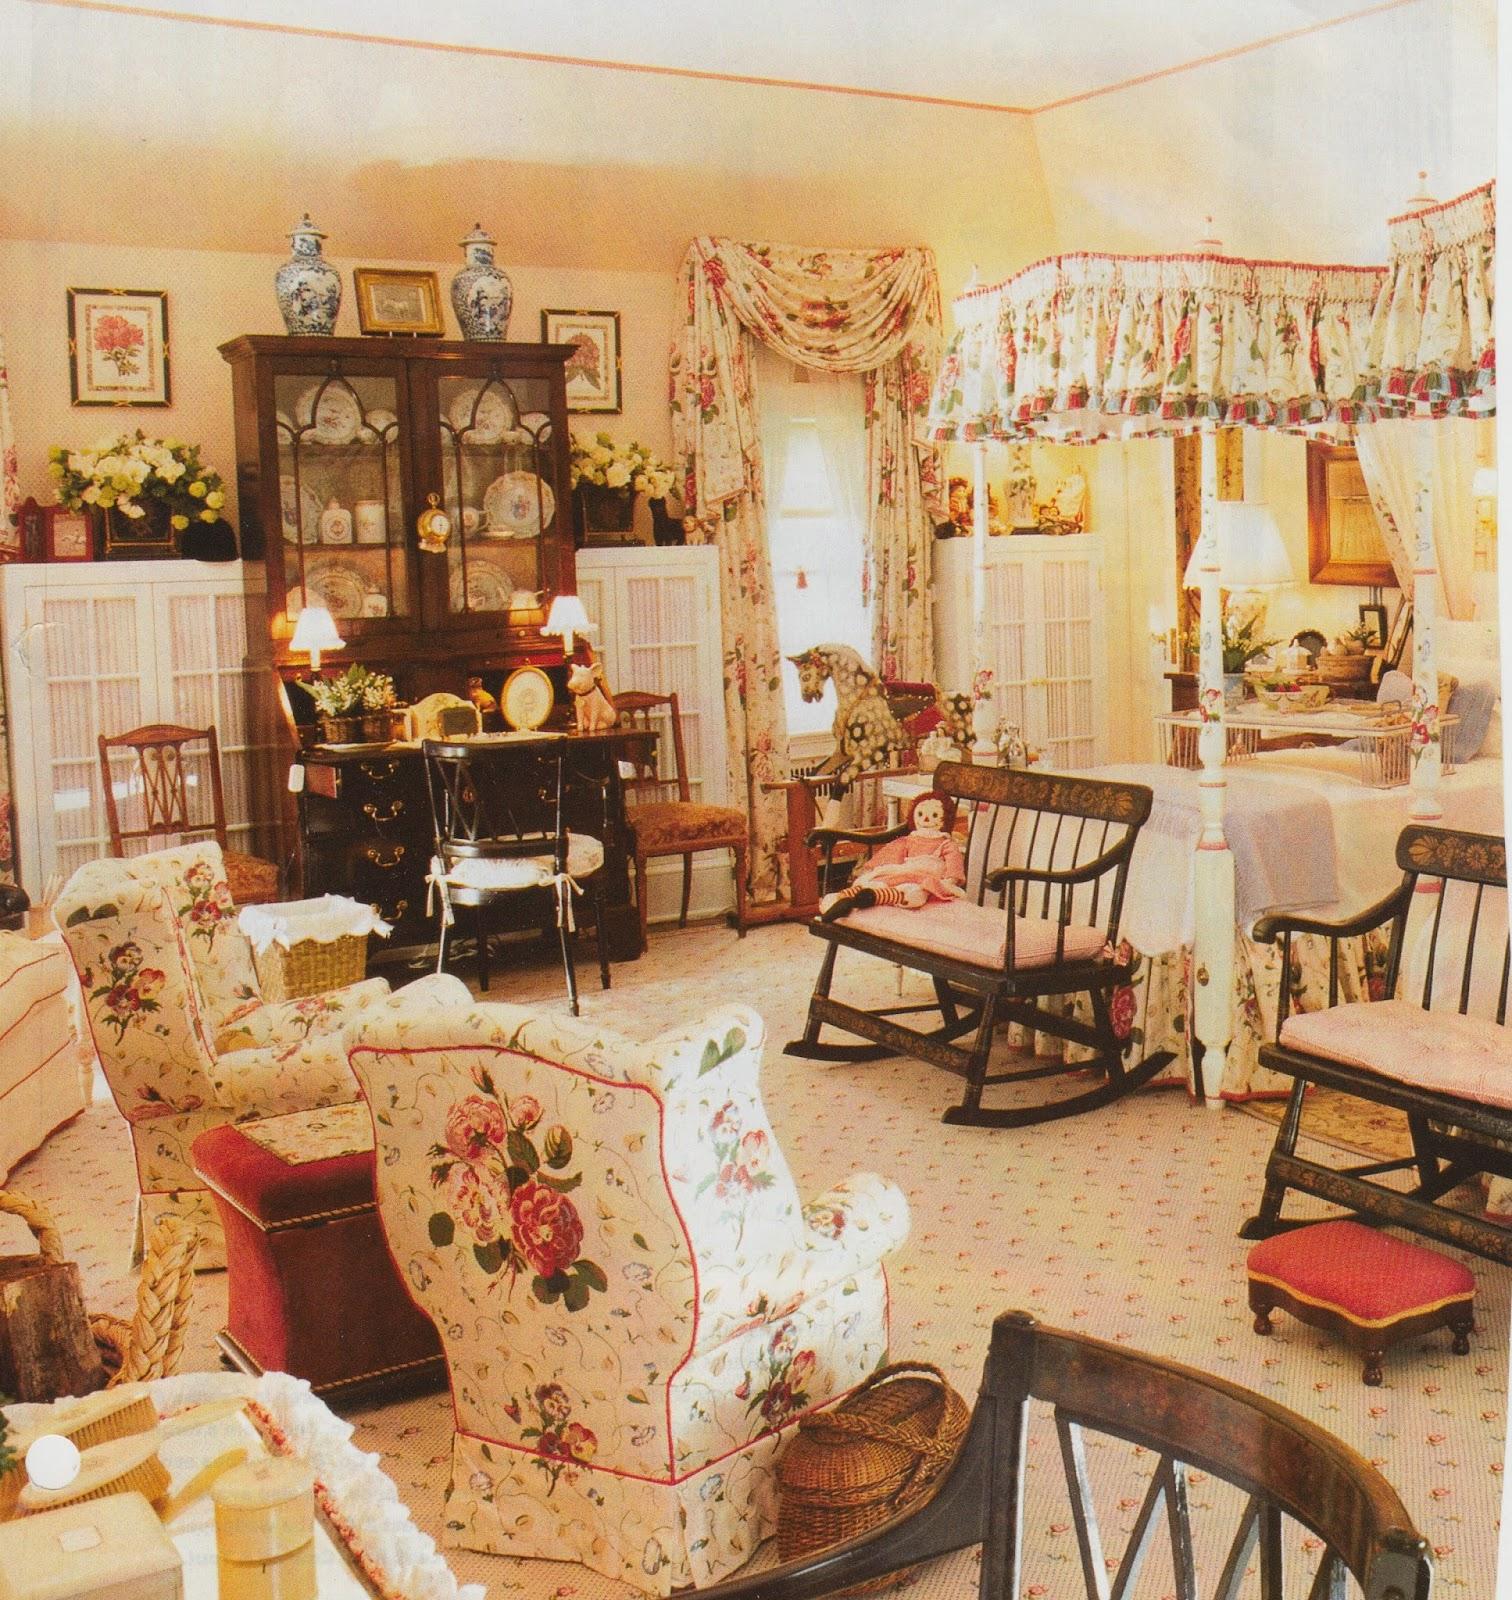 Hydrangea Hill Cottage: English country decor